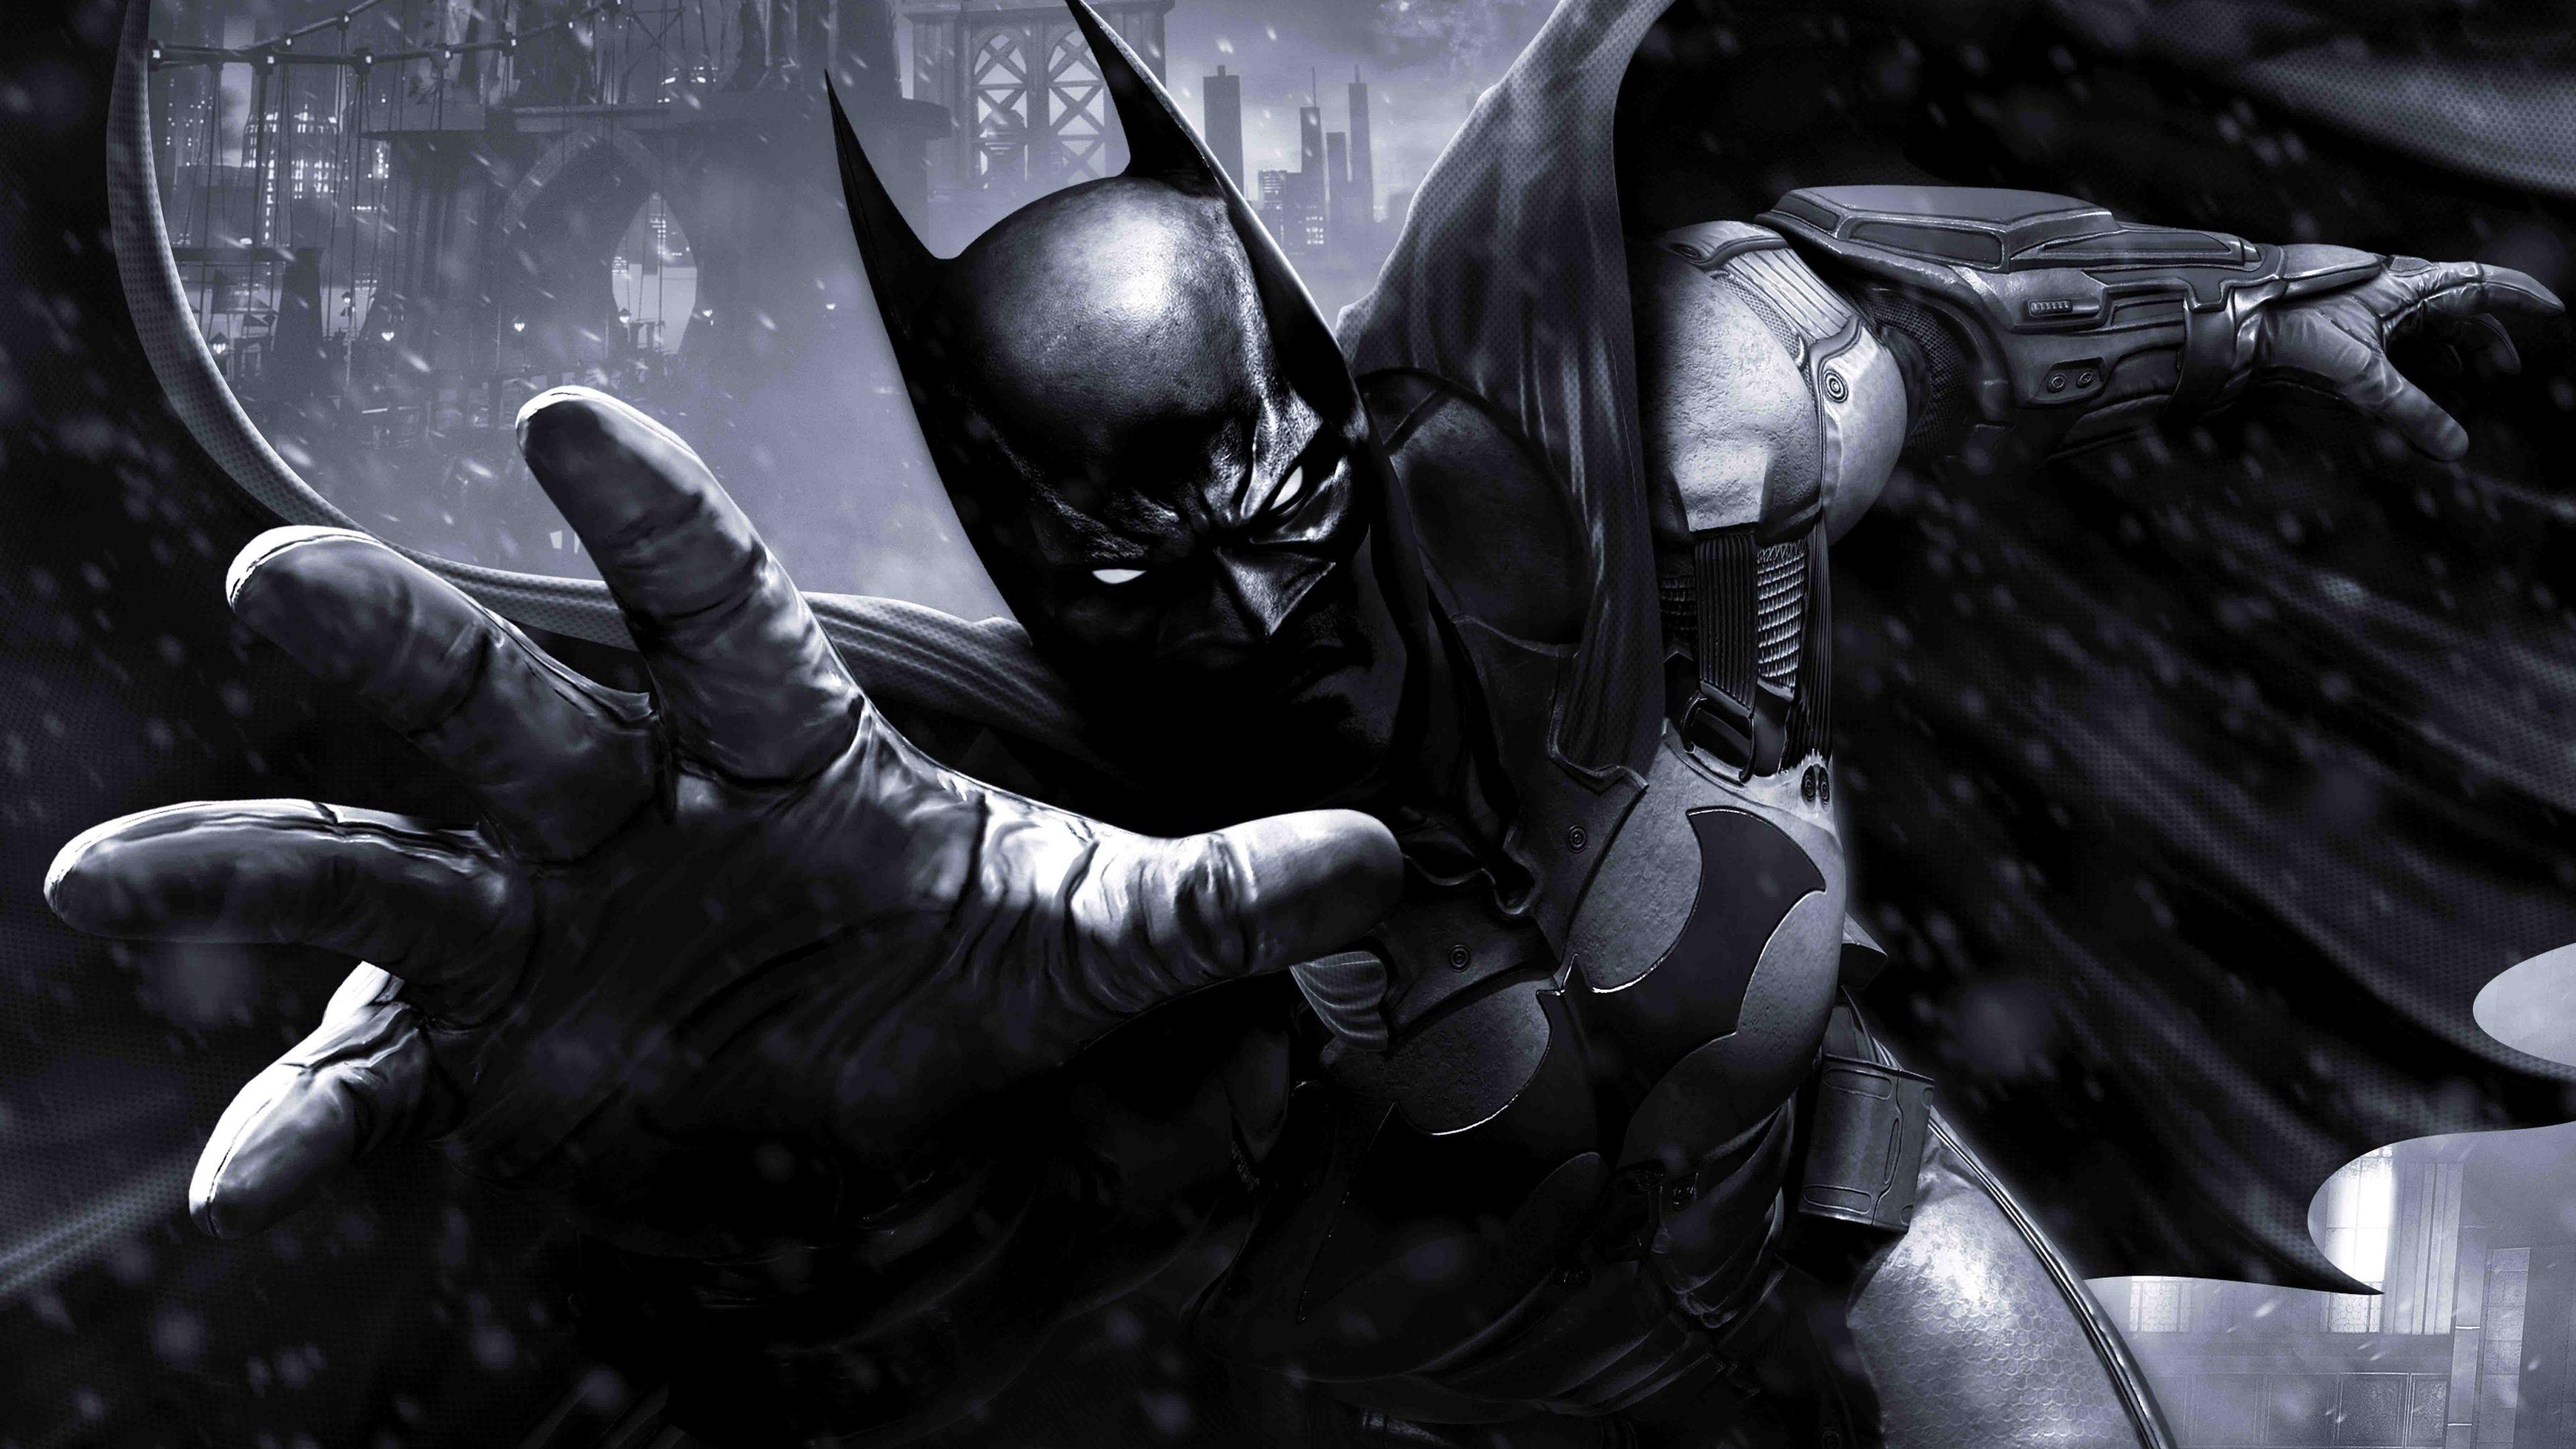 Batman Arkham Knight4k Hd Wallpapers Games Wallpapers